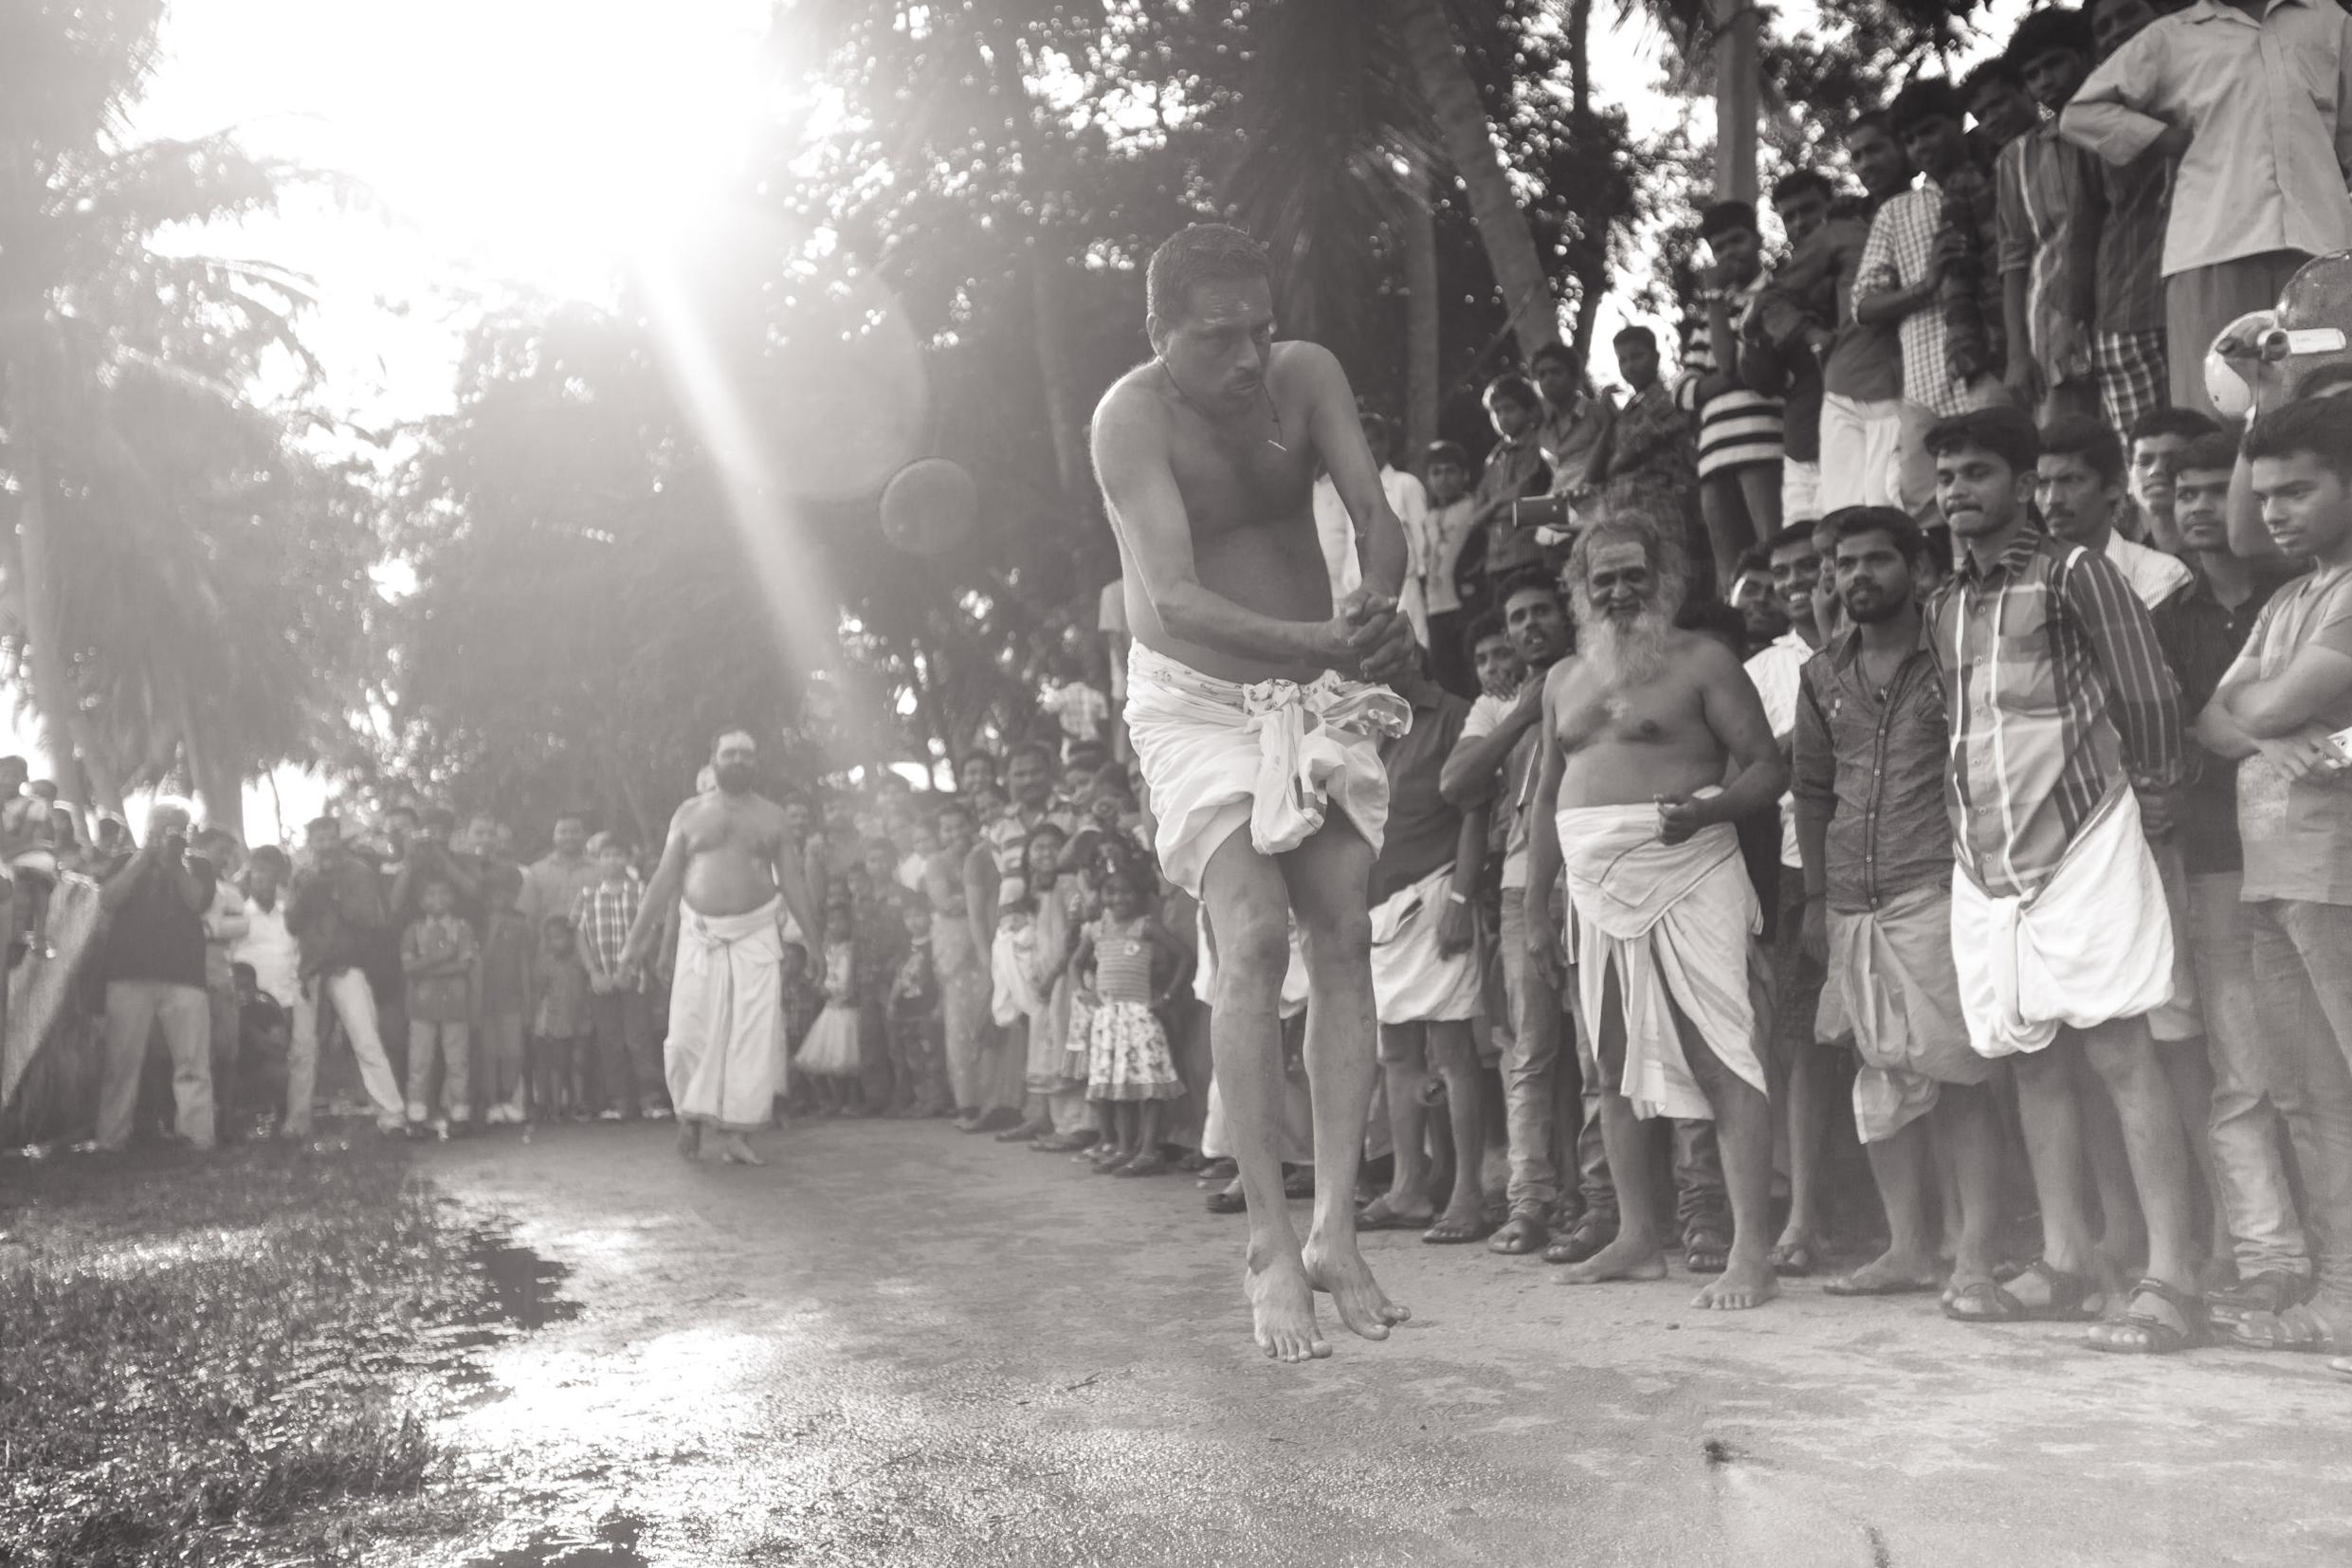 Sindhur_Photography_Travel_People_Kerala-10.JPG